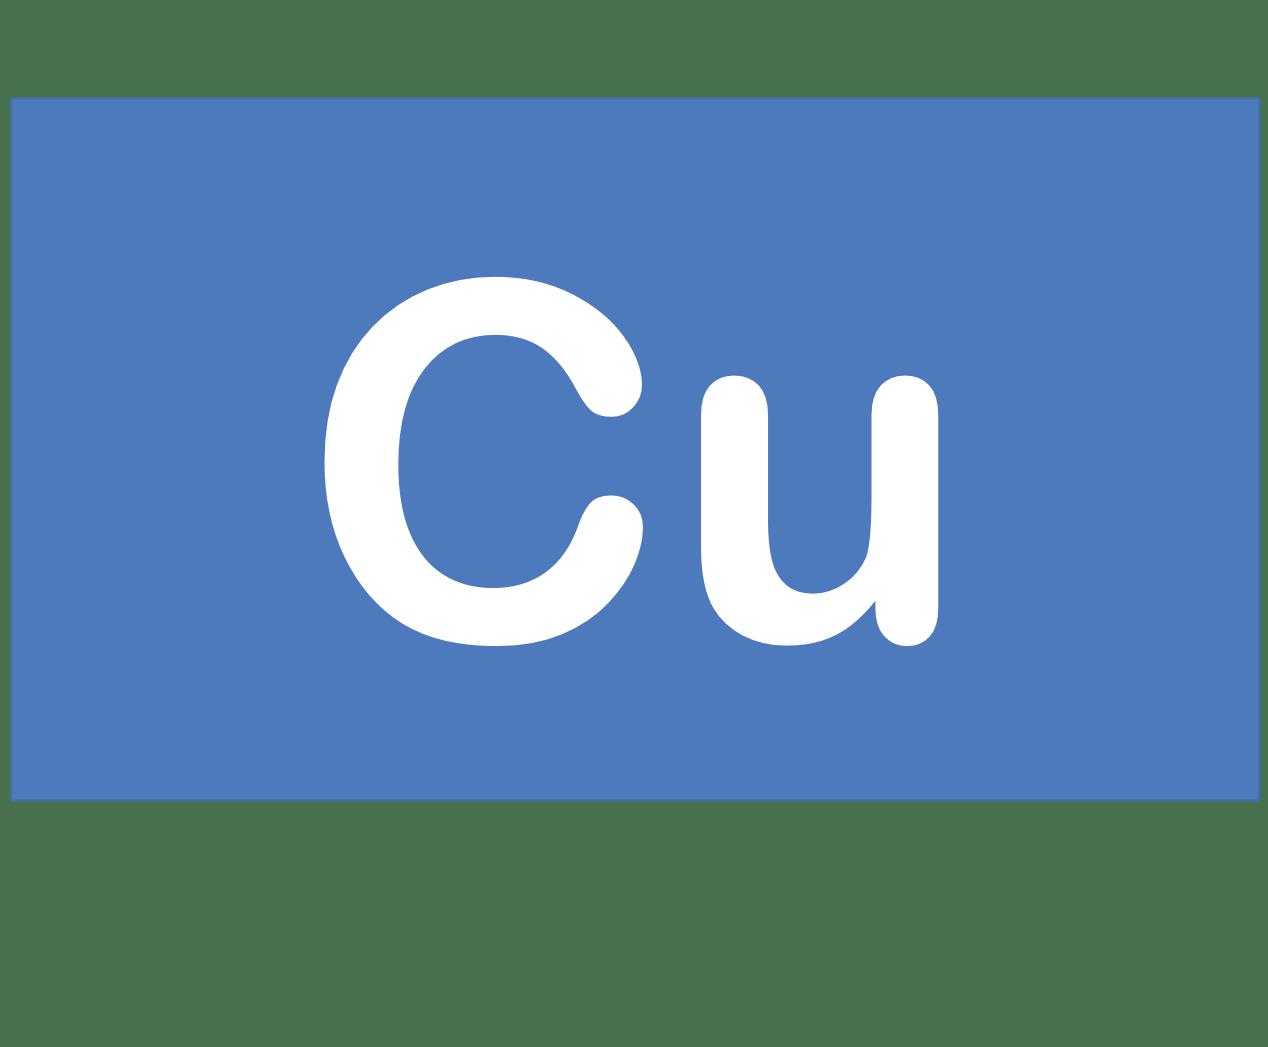 29 Cu 銅 Copper 元素 記号 周期表 化学 原子